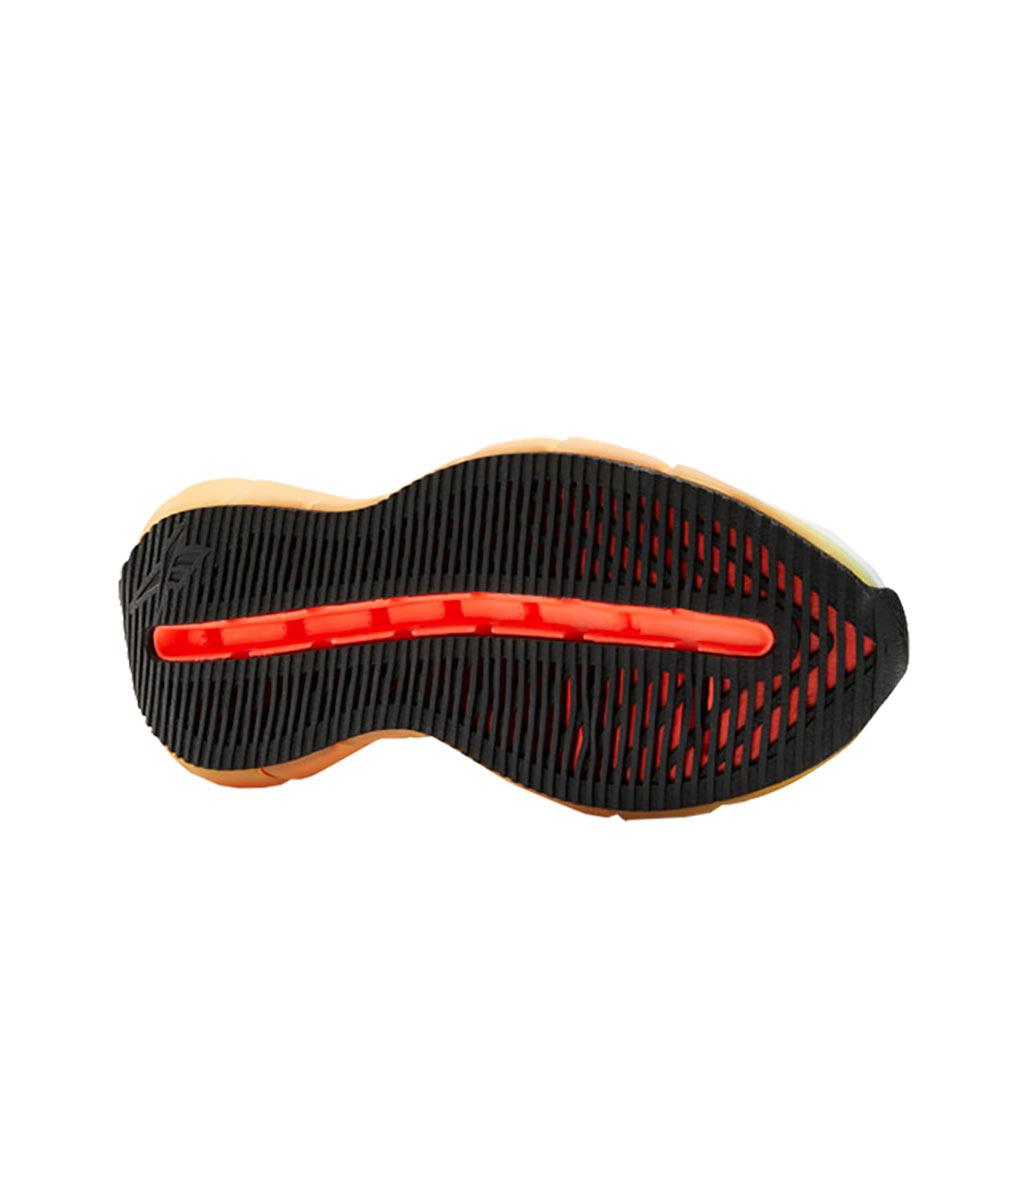 Reebok Zig Kinetica 21 Ayakkabı Beyaz